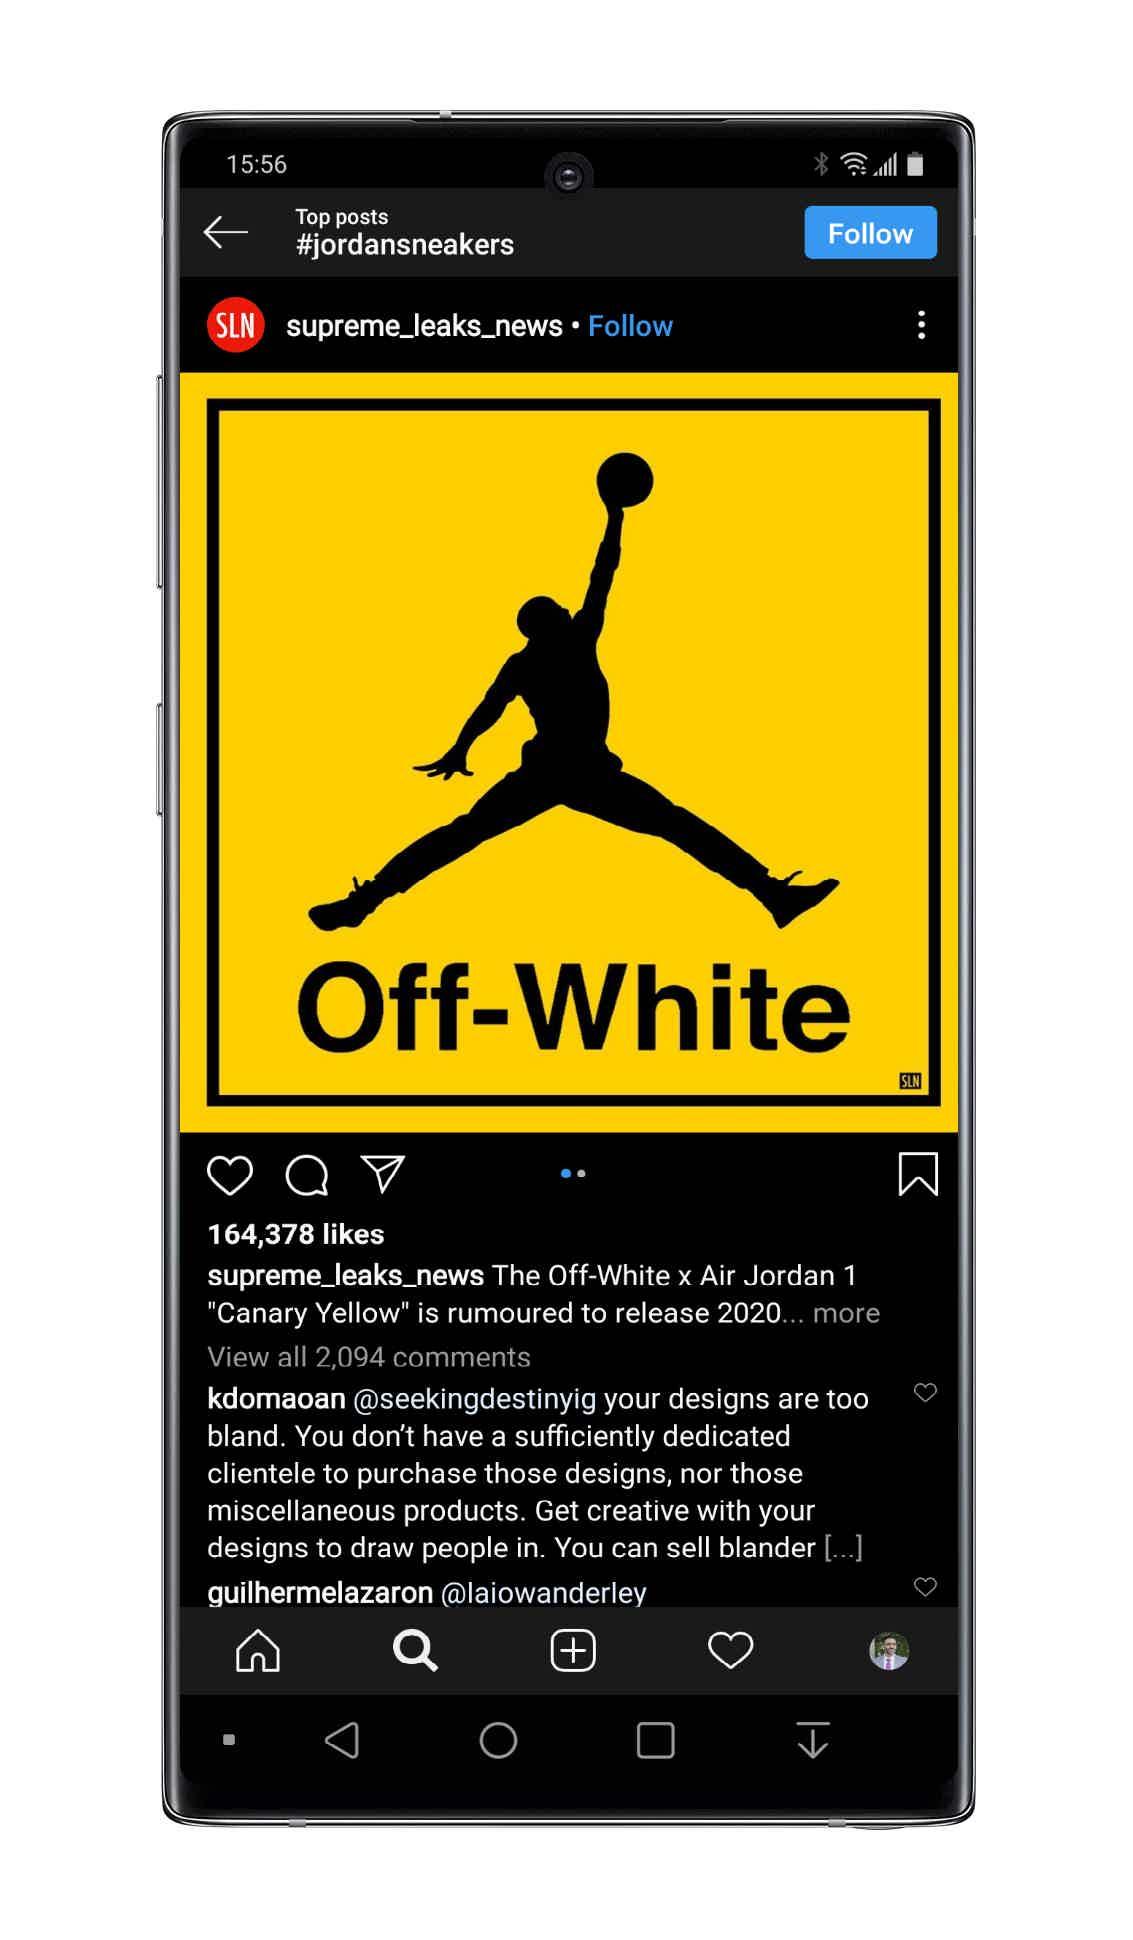 Instagram Jordan Sneakers top post